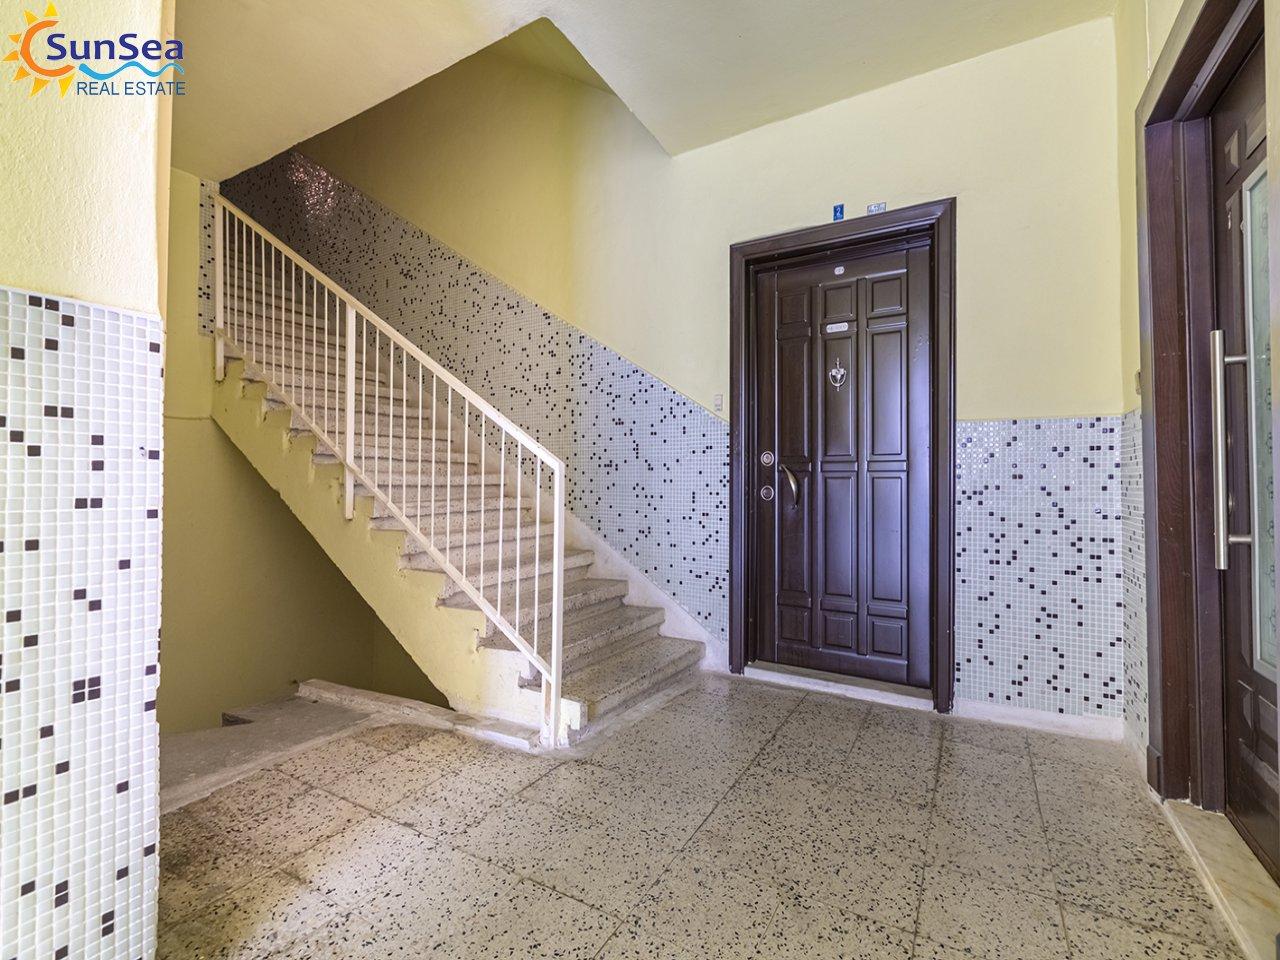 özkaya apart steps